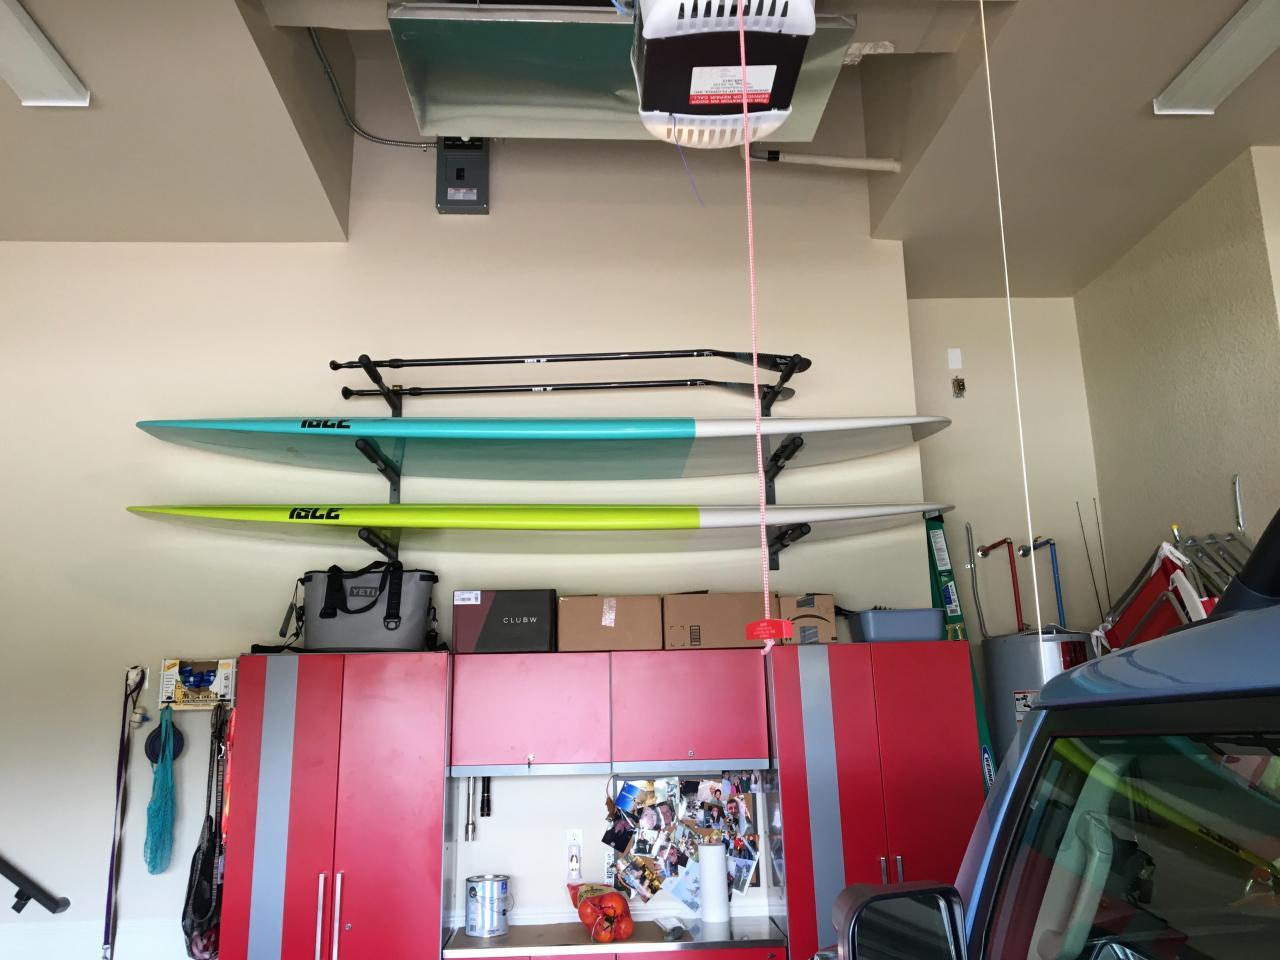 Standup Paddleboard Wall Storage Rack Storeyourboard Com